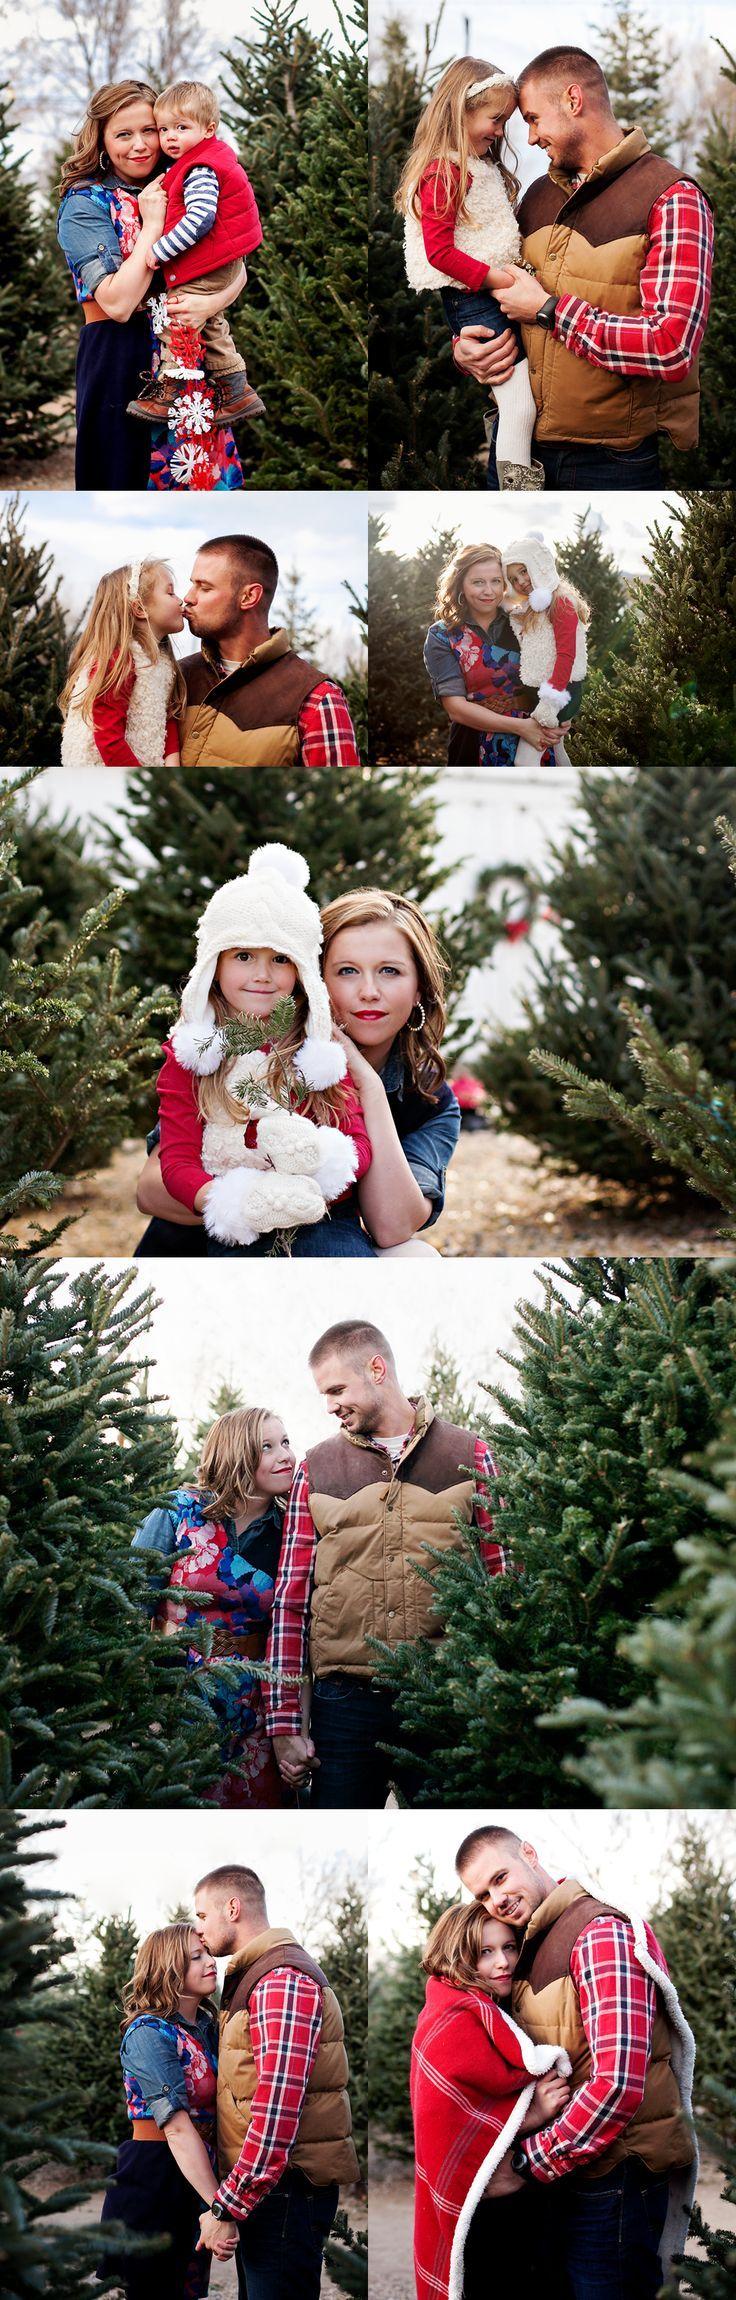 amazing photo session at a christmas tree farm in colorado - Christmas Tree Farm Colorado